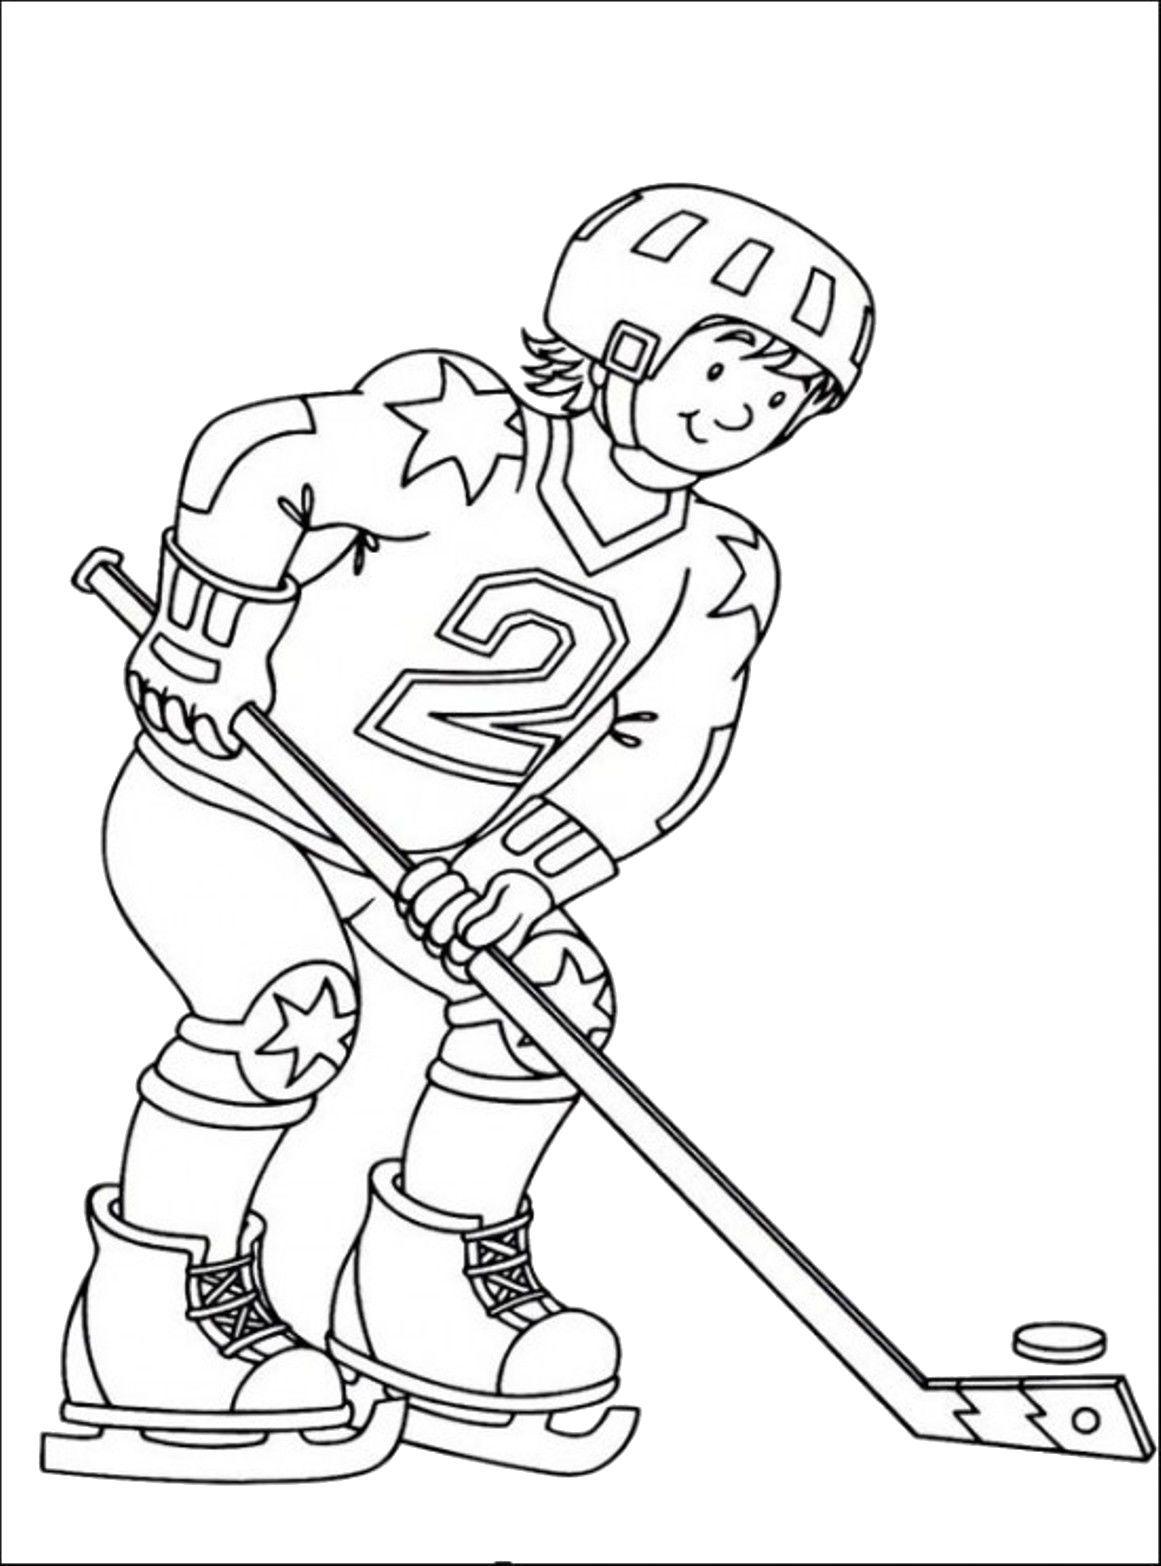 Woman Playing Hockey   Hockey   Pinterest